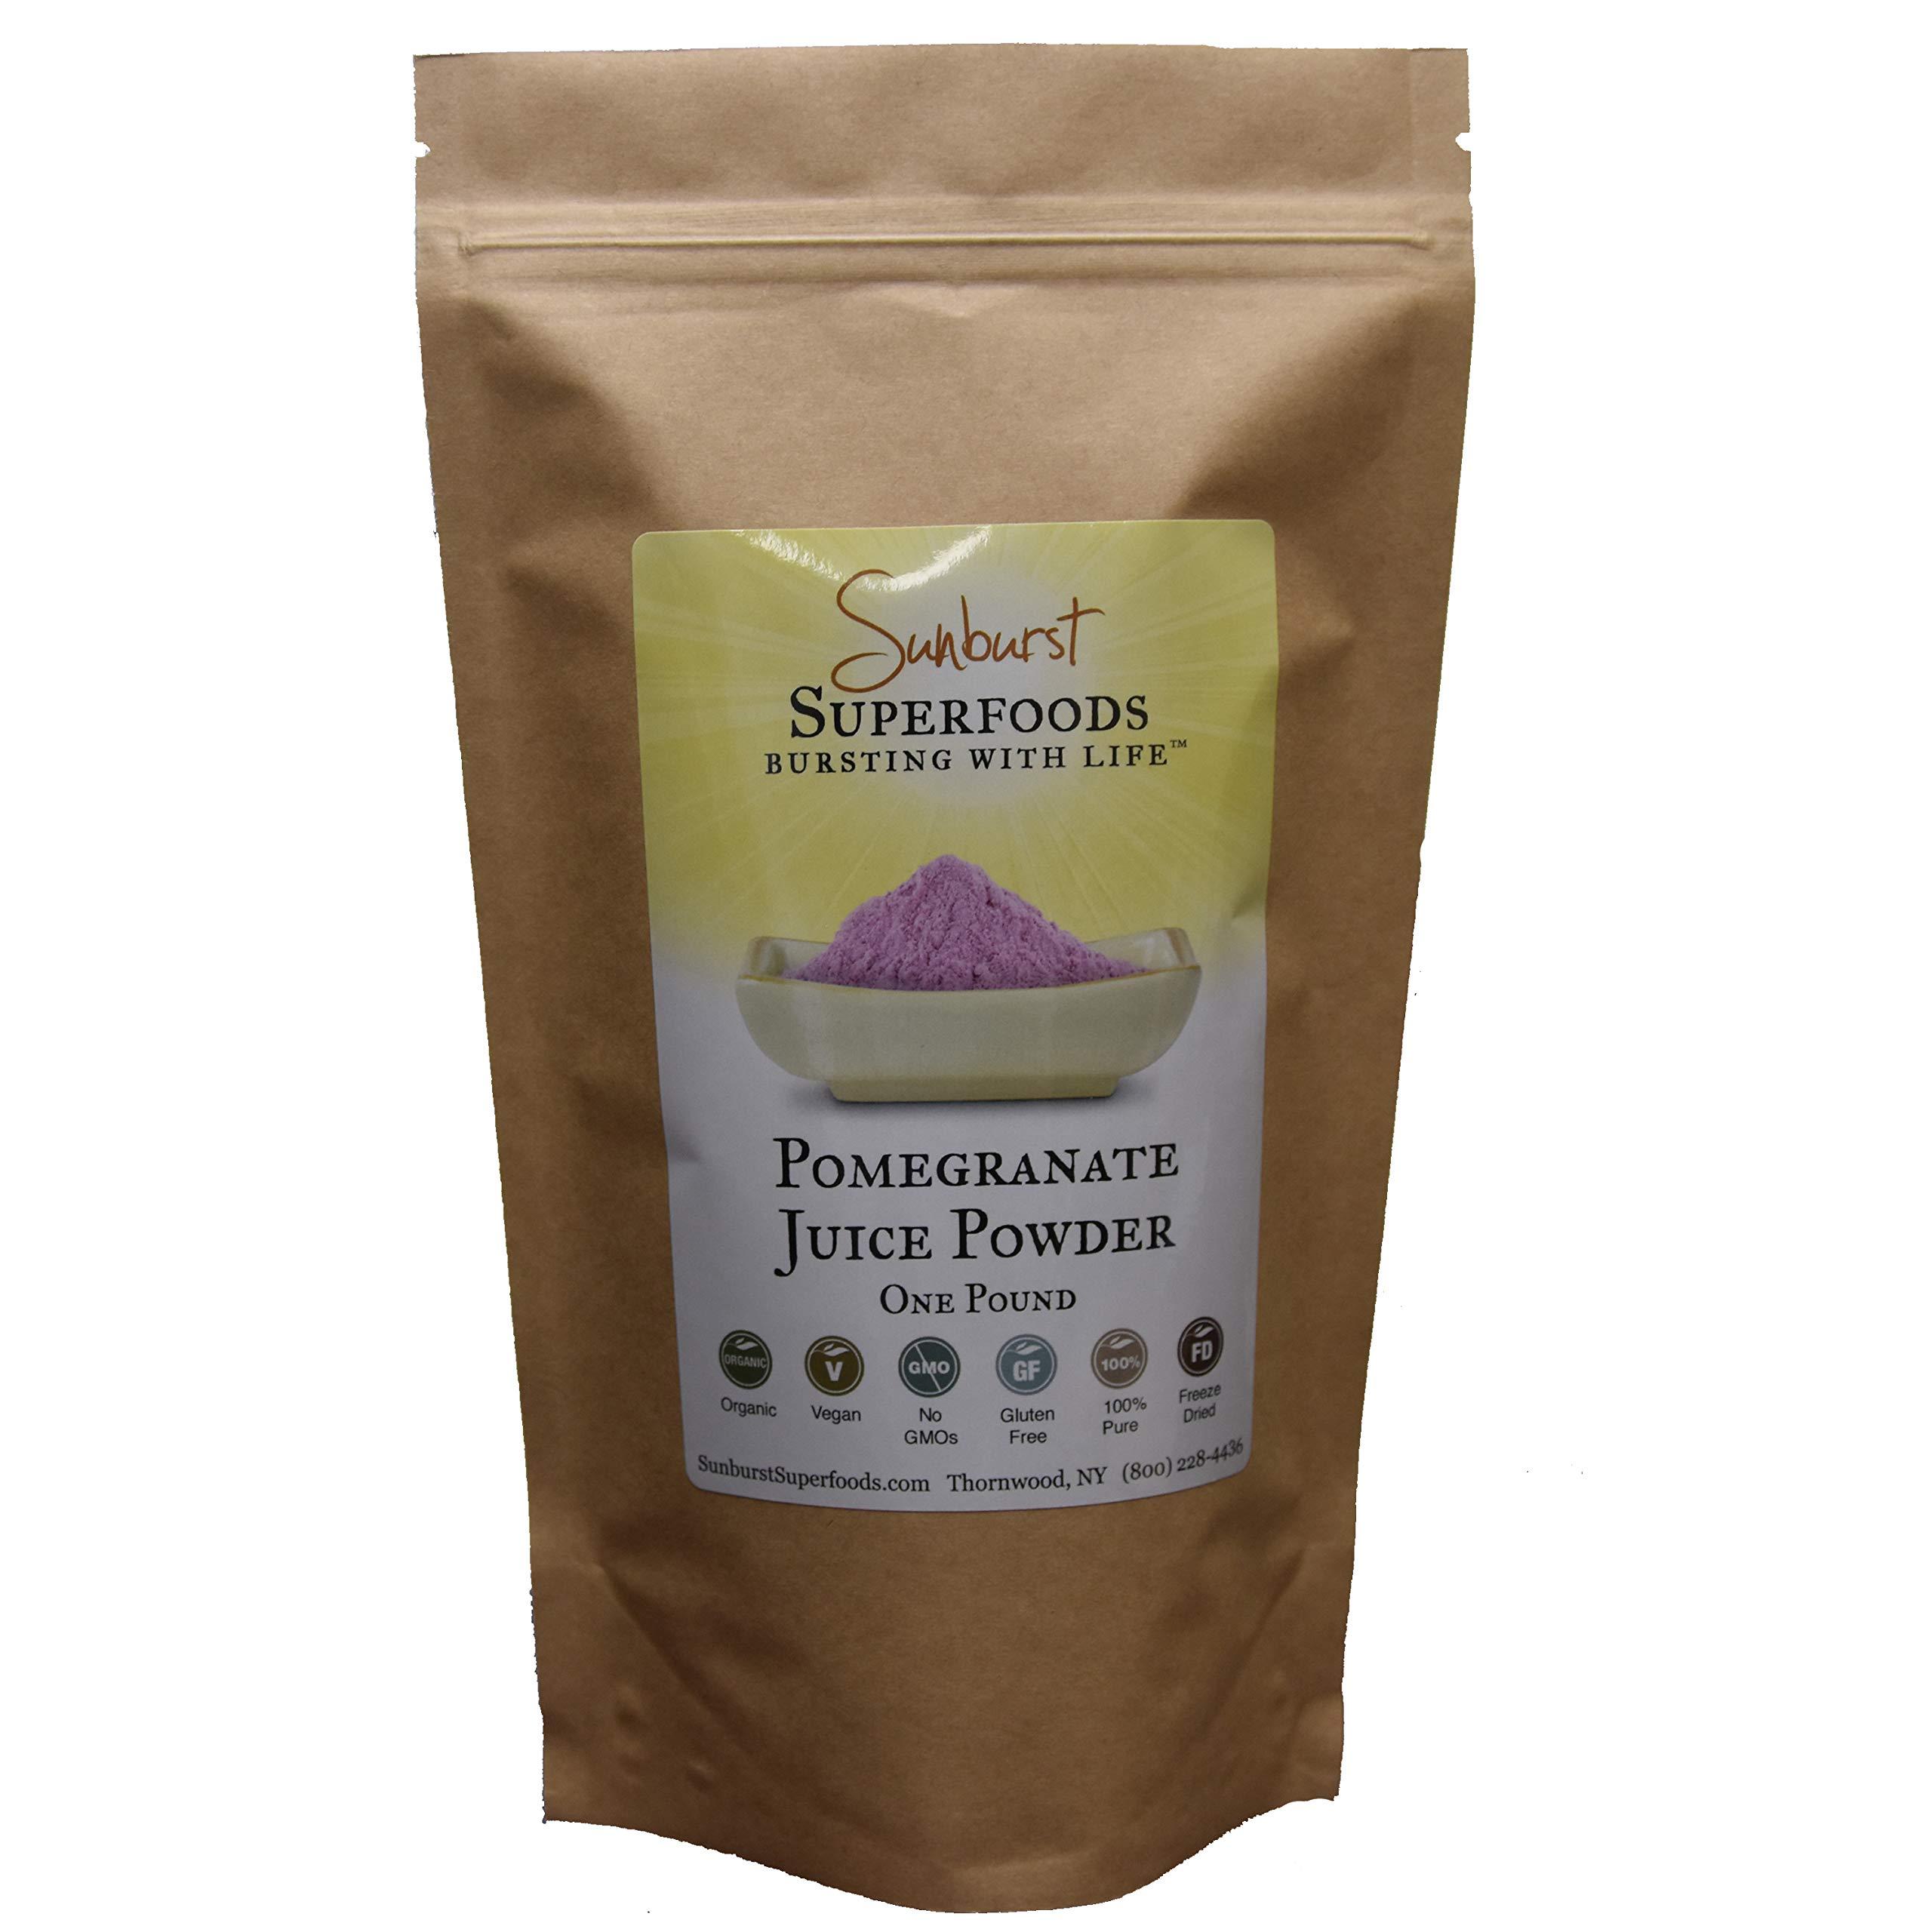 Sunburst Superfoods Organic Freeze-Dried Pomegranate Juice Powder, 1 lb